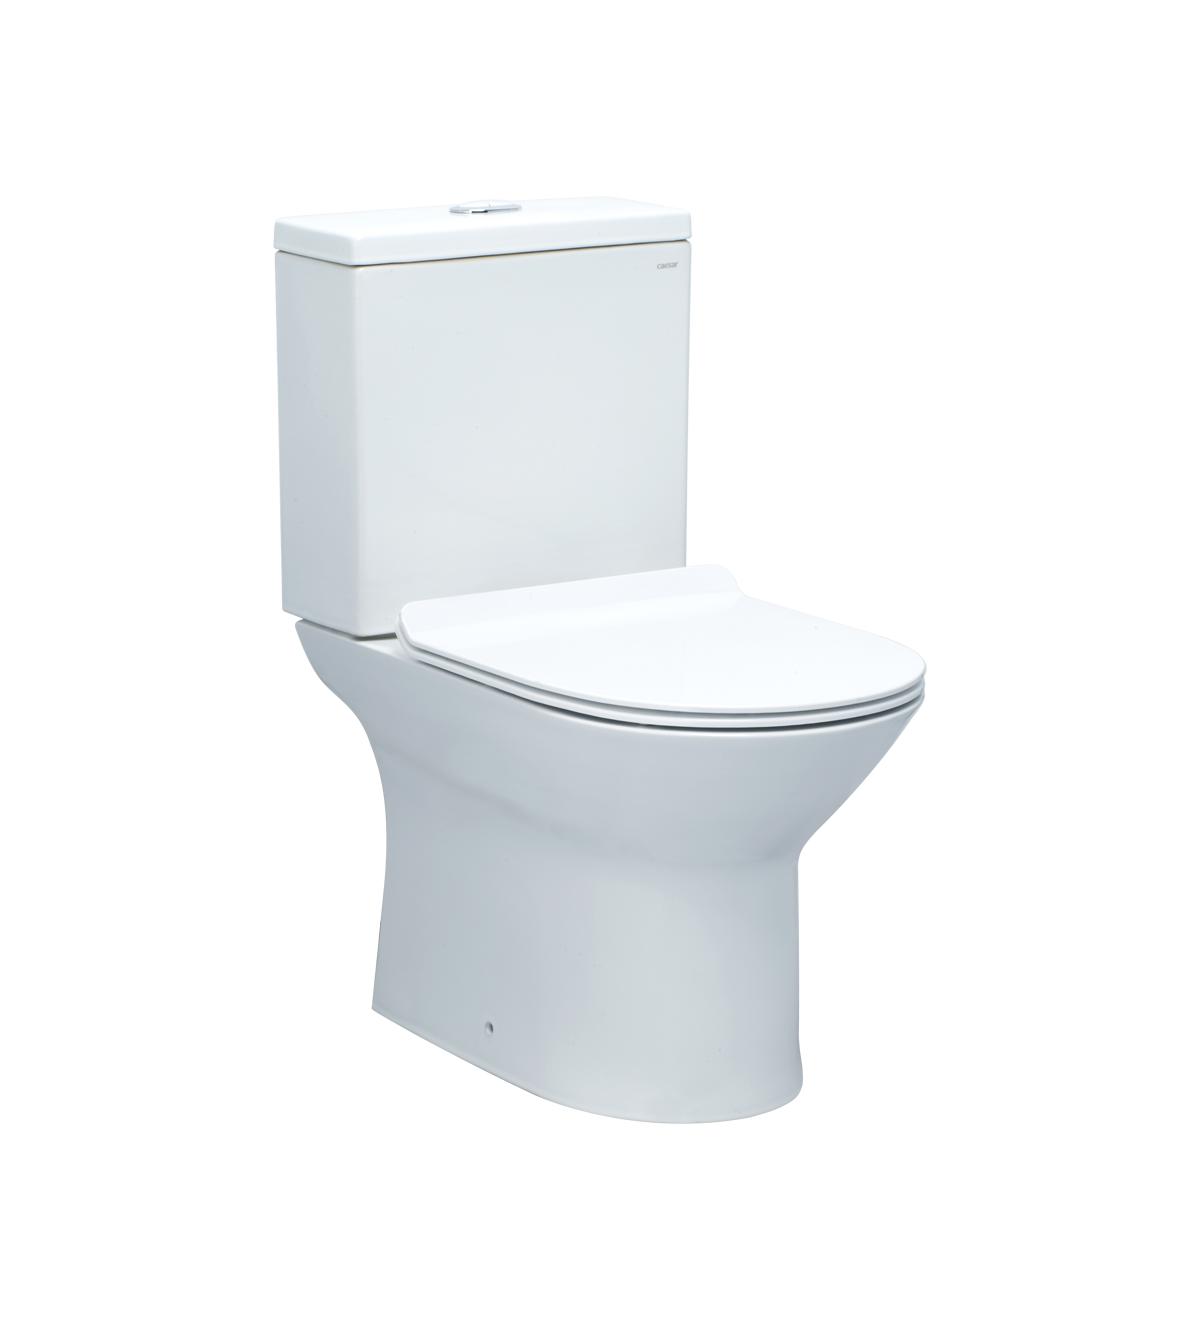 Wc Set. Stunning Hung Wc Set With Toilet Bowl Flat Soft Close Seat ...